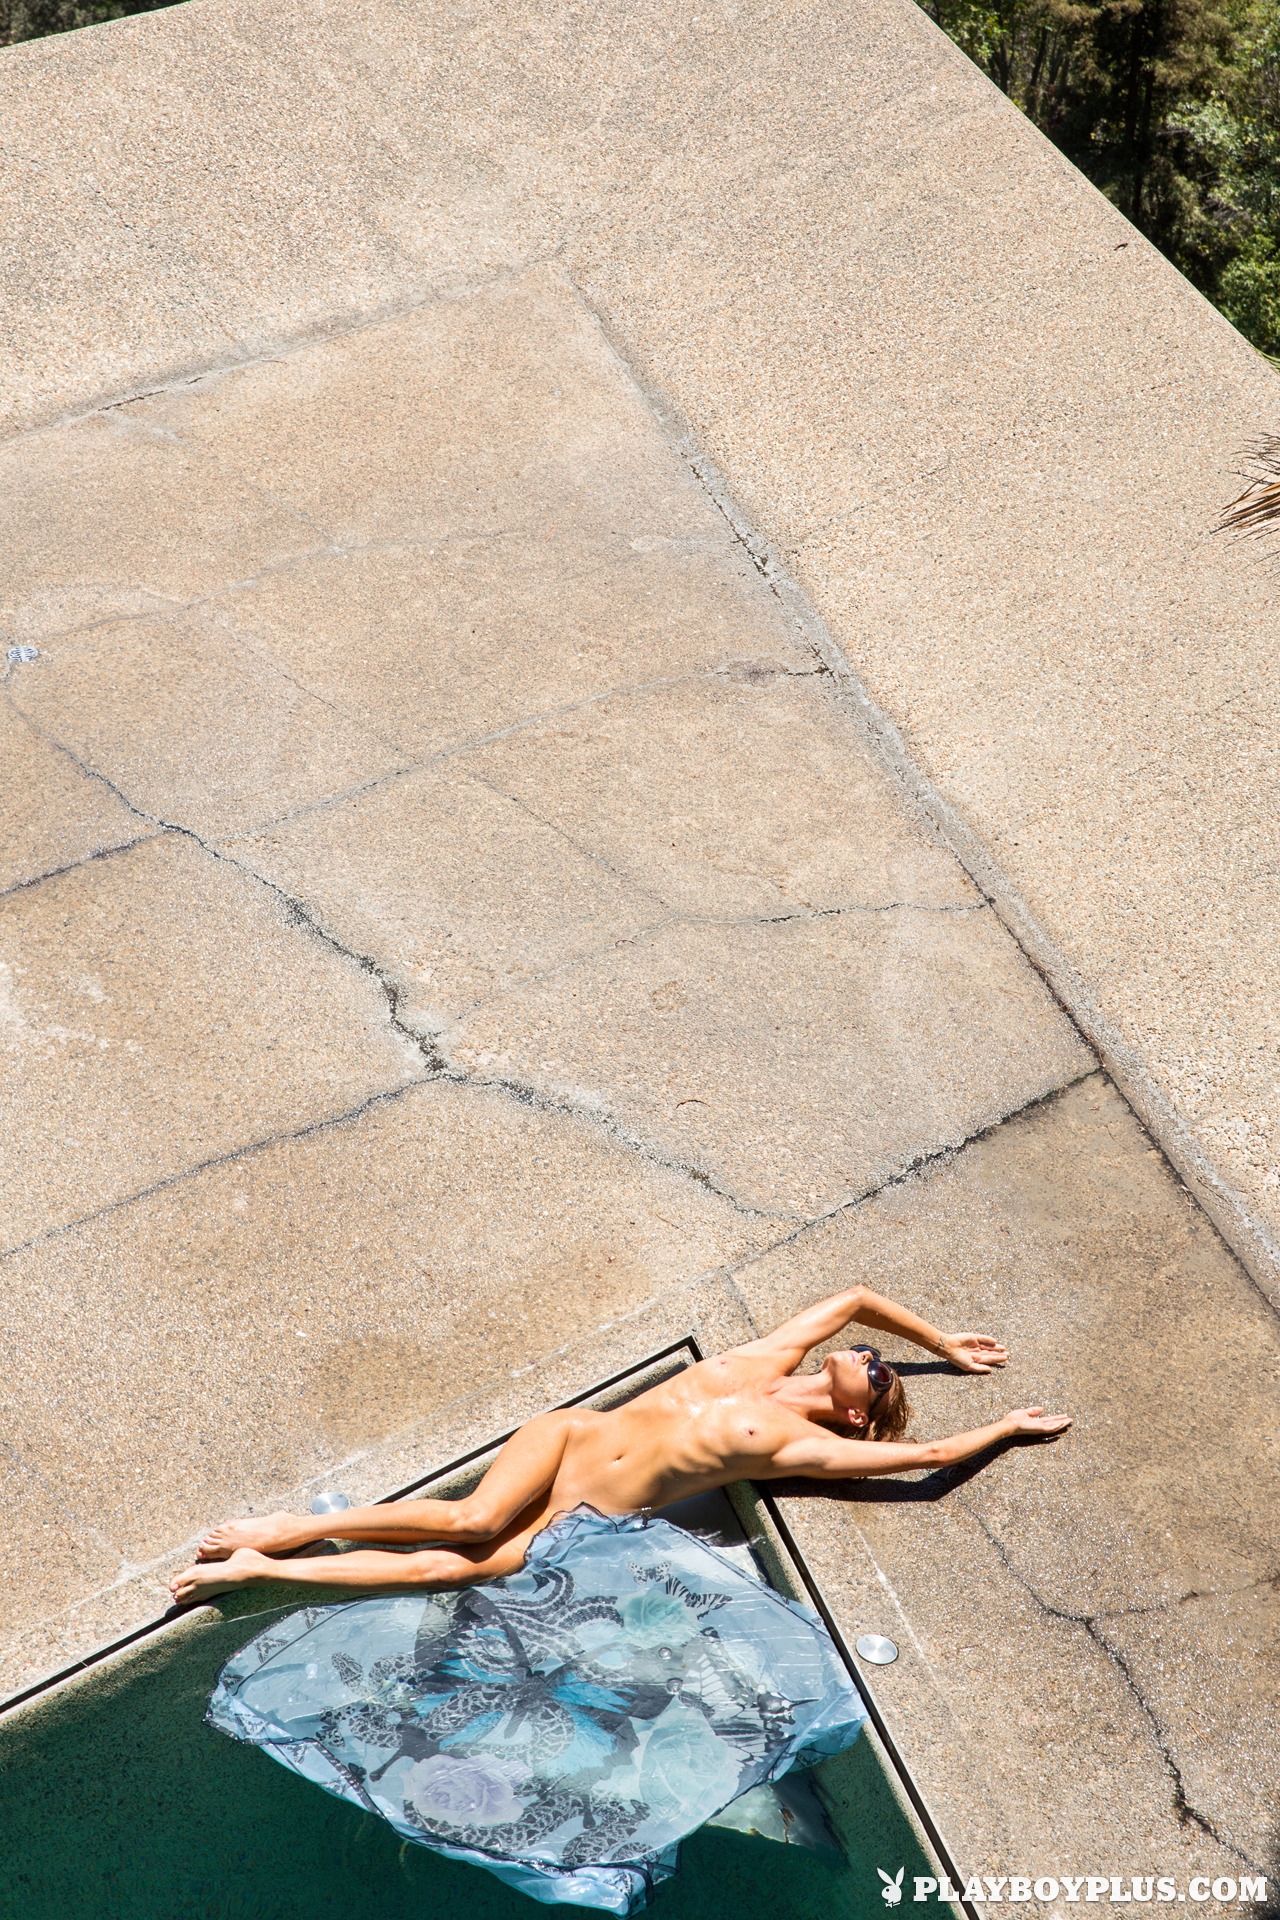 gia-marie-pool-wet-naked-sunglasses-playboy-14